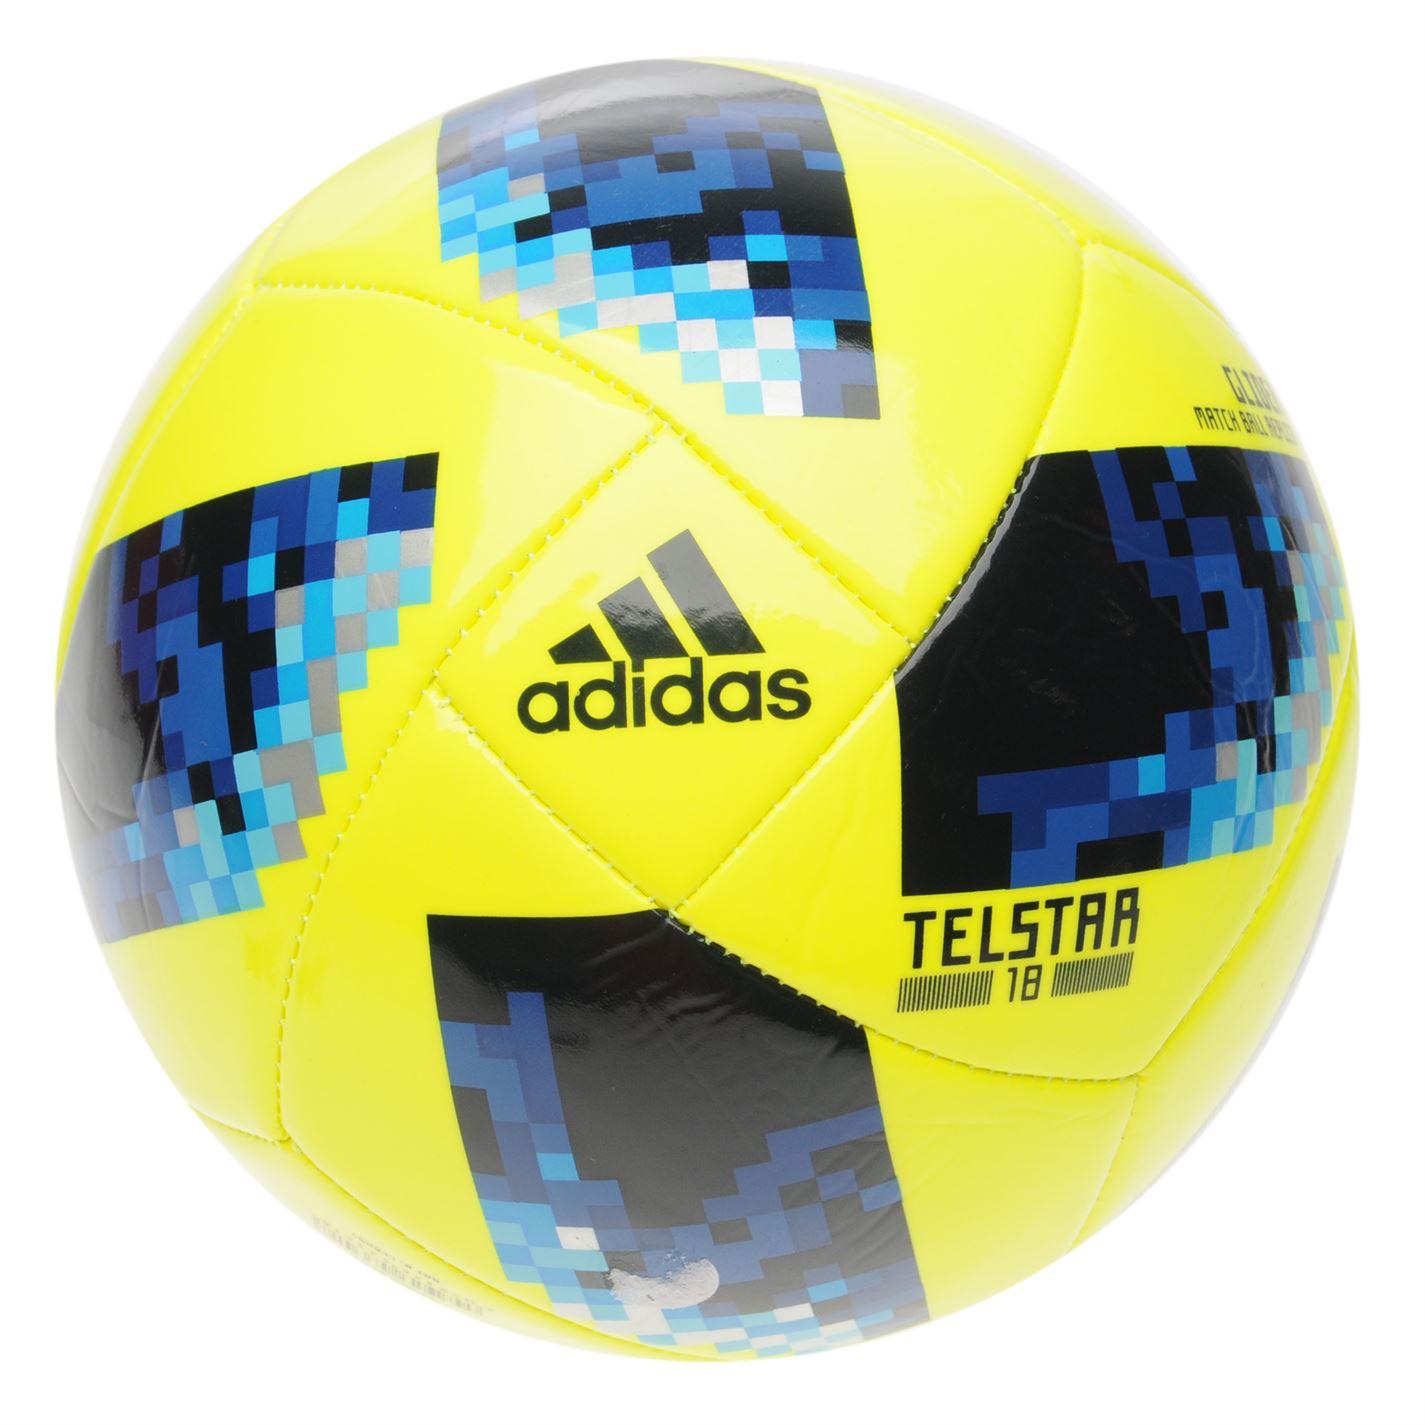 adidas World Cup 2018 Glider Football